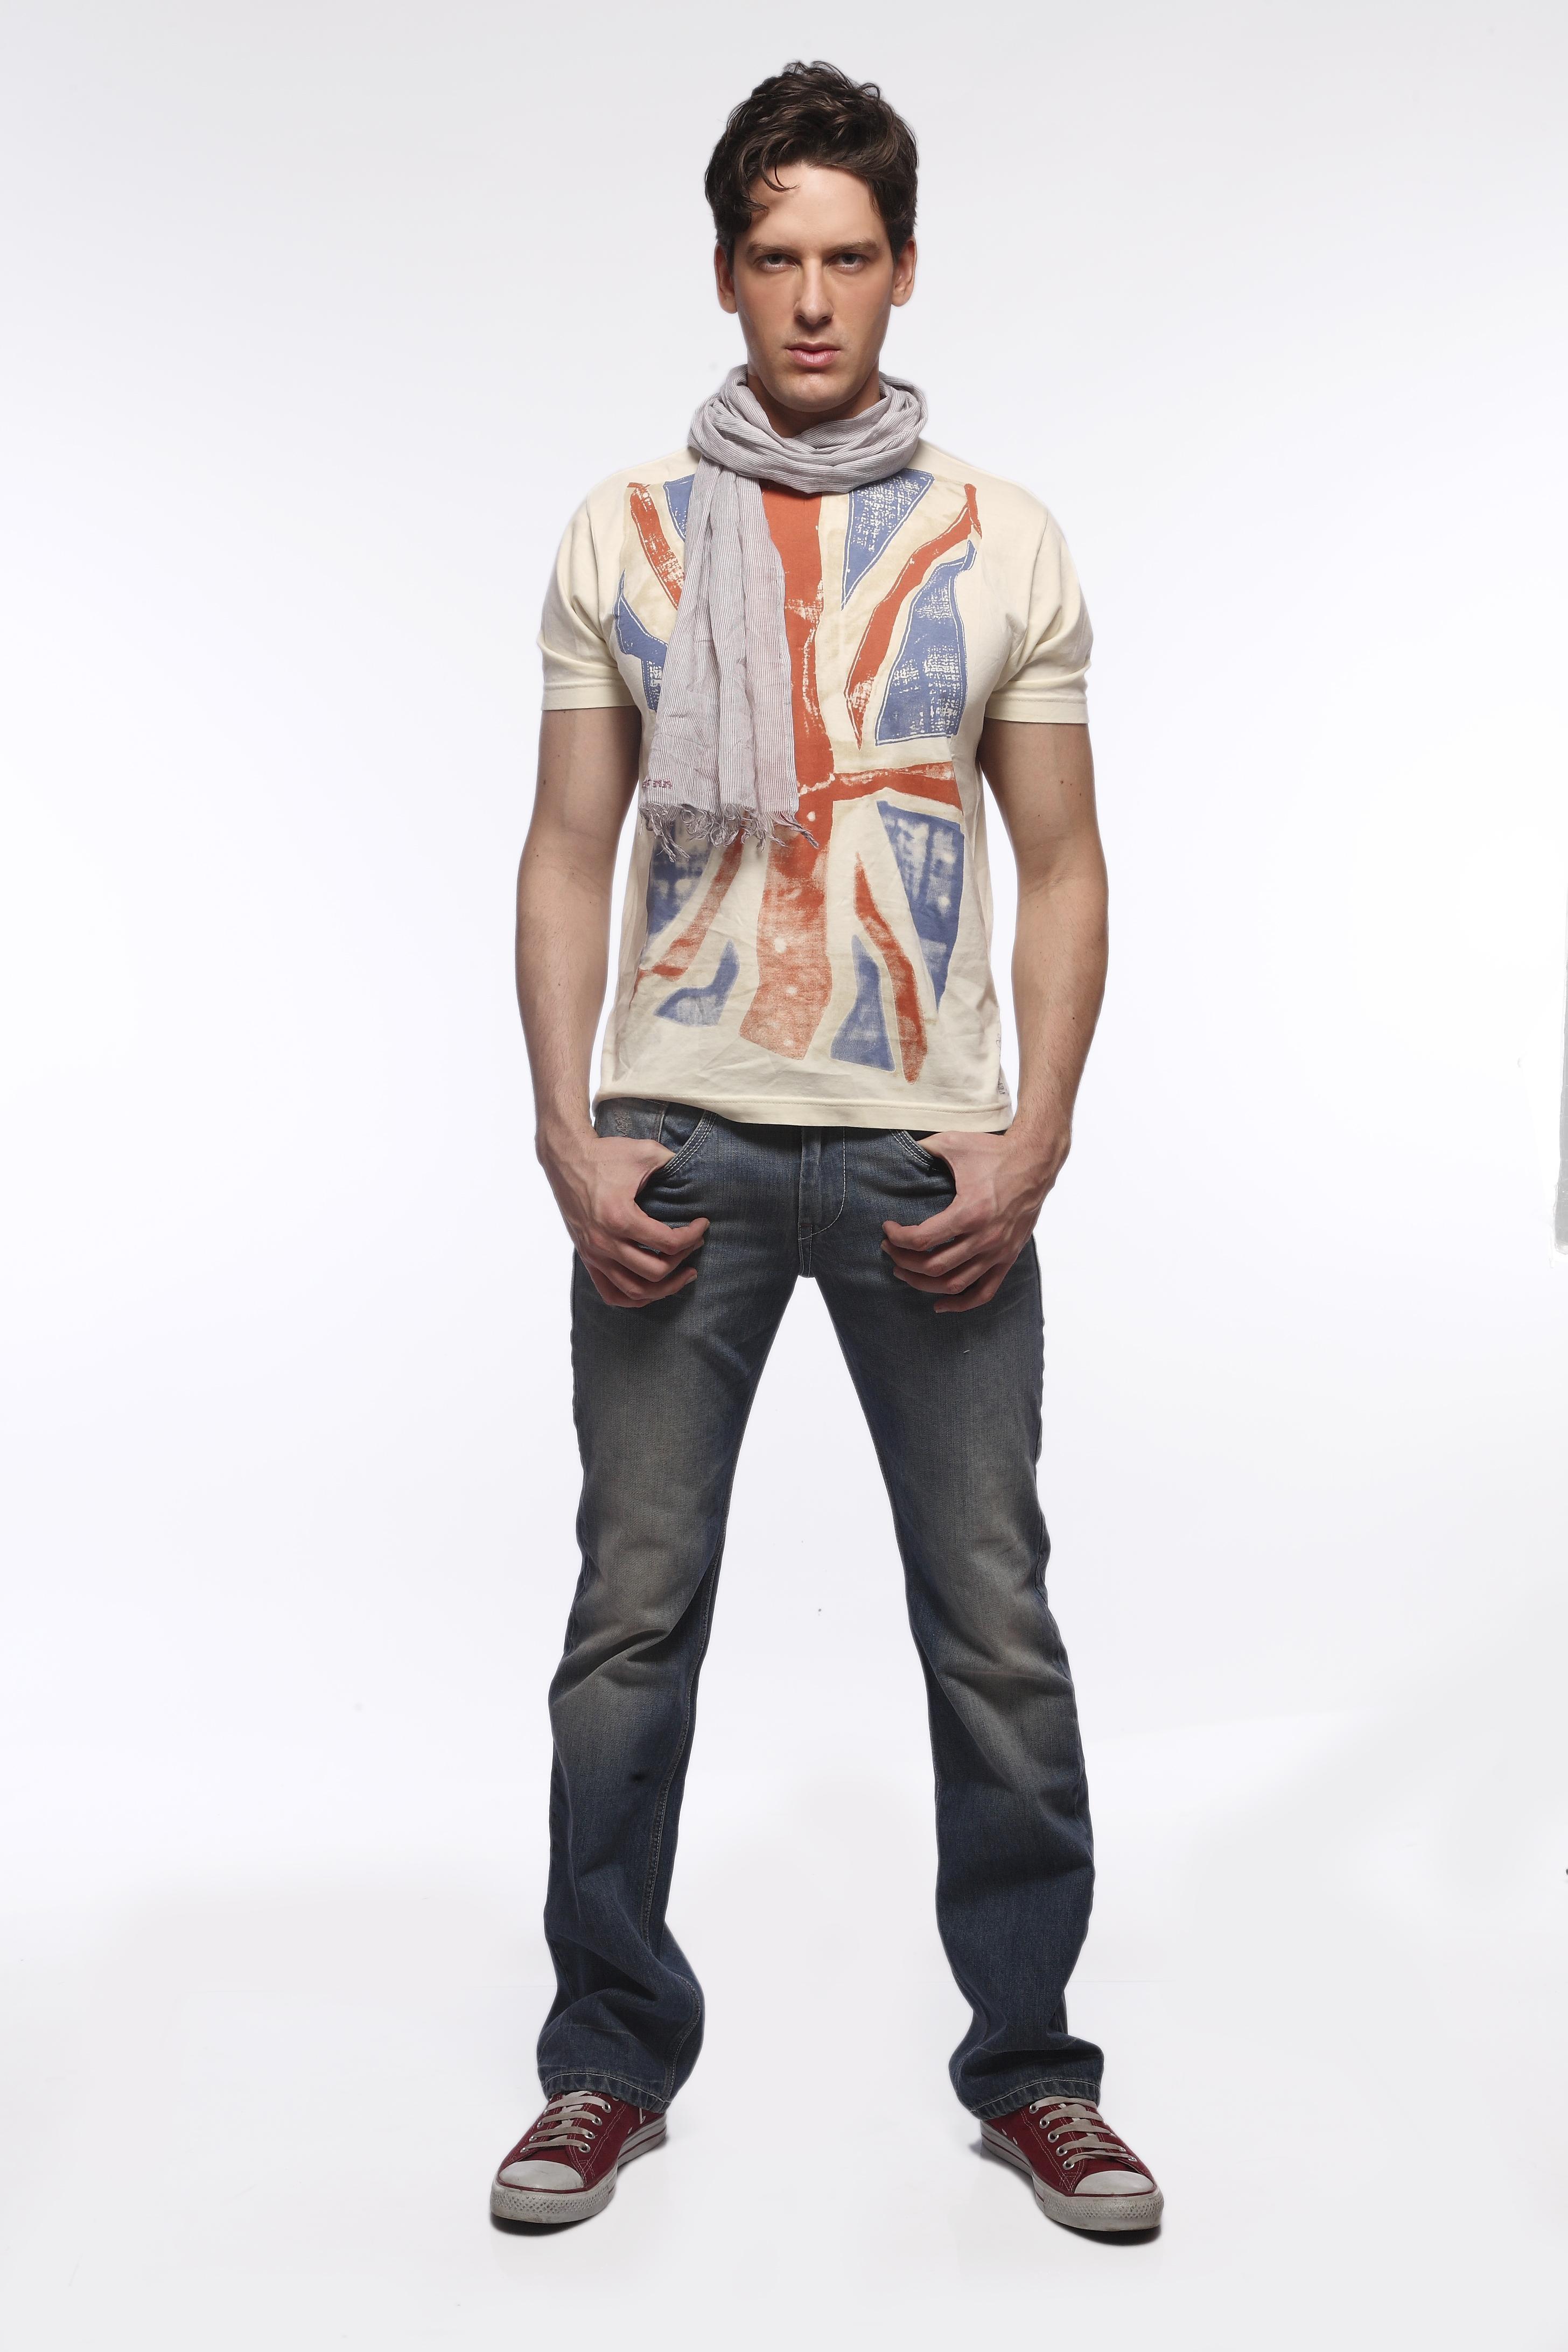 Spring Summer Jeans Fashion Trend Men 2013 Photograph